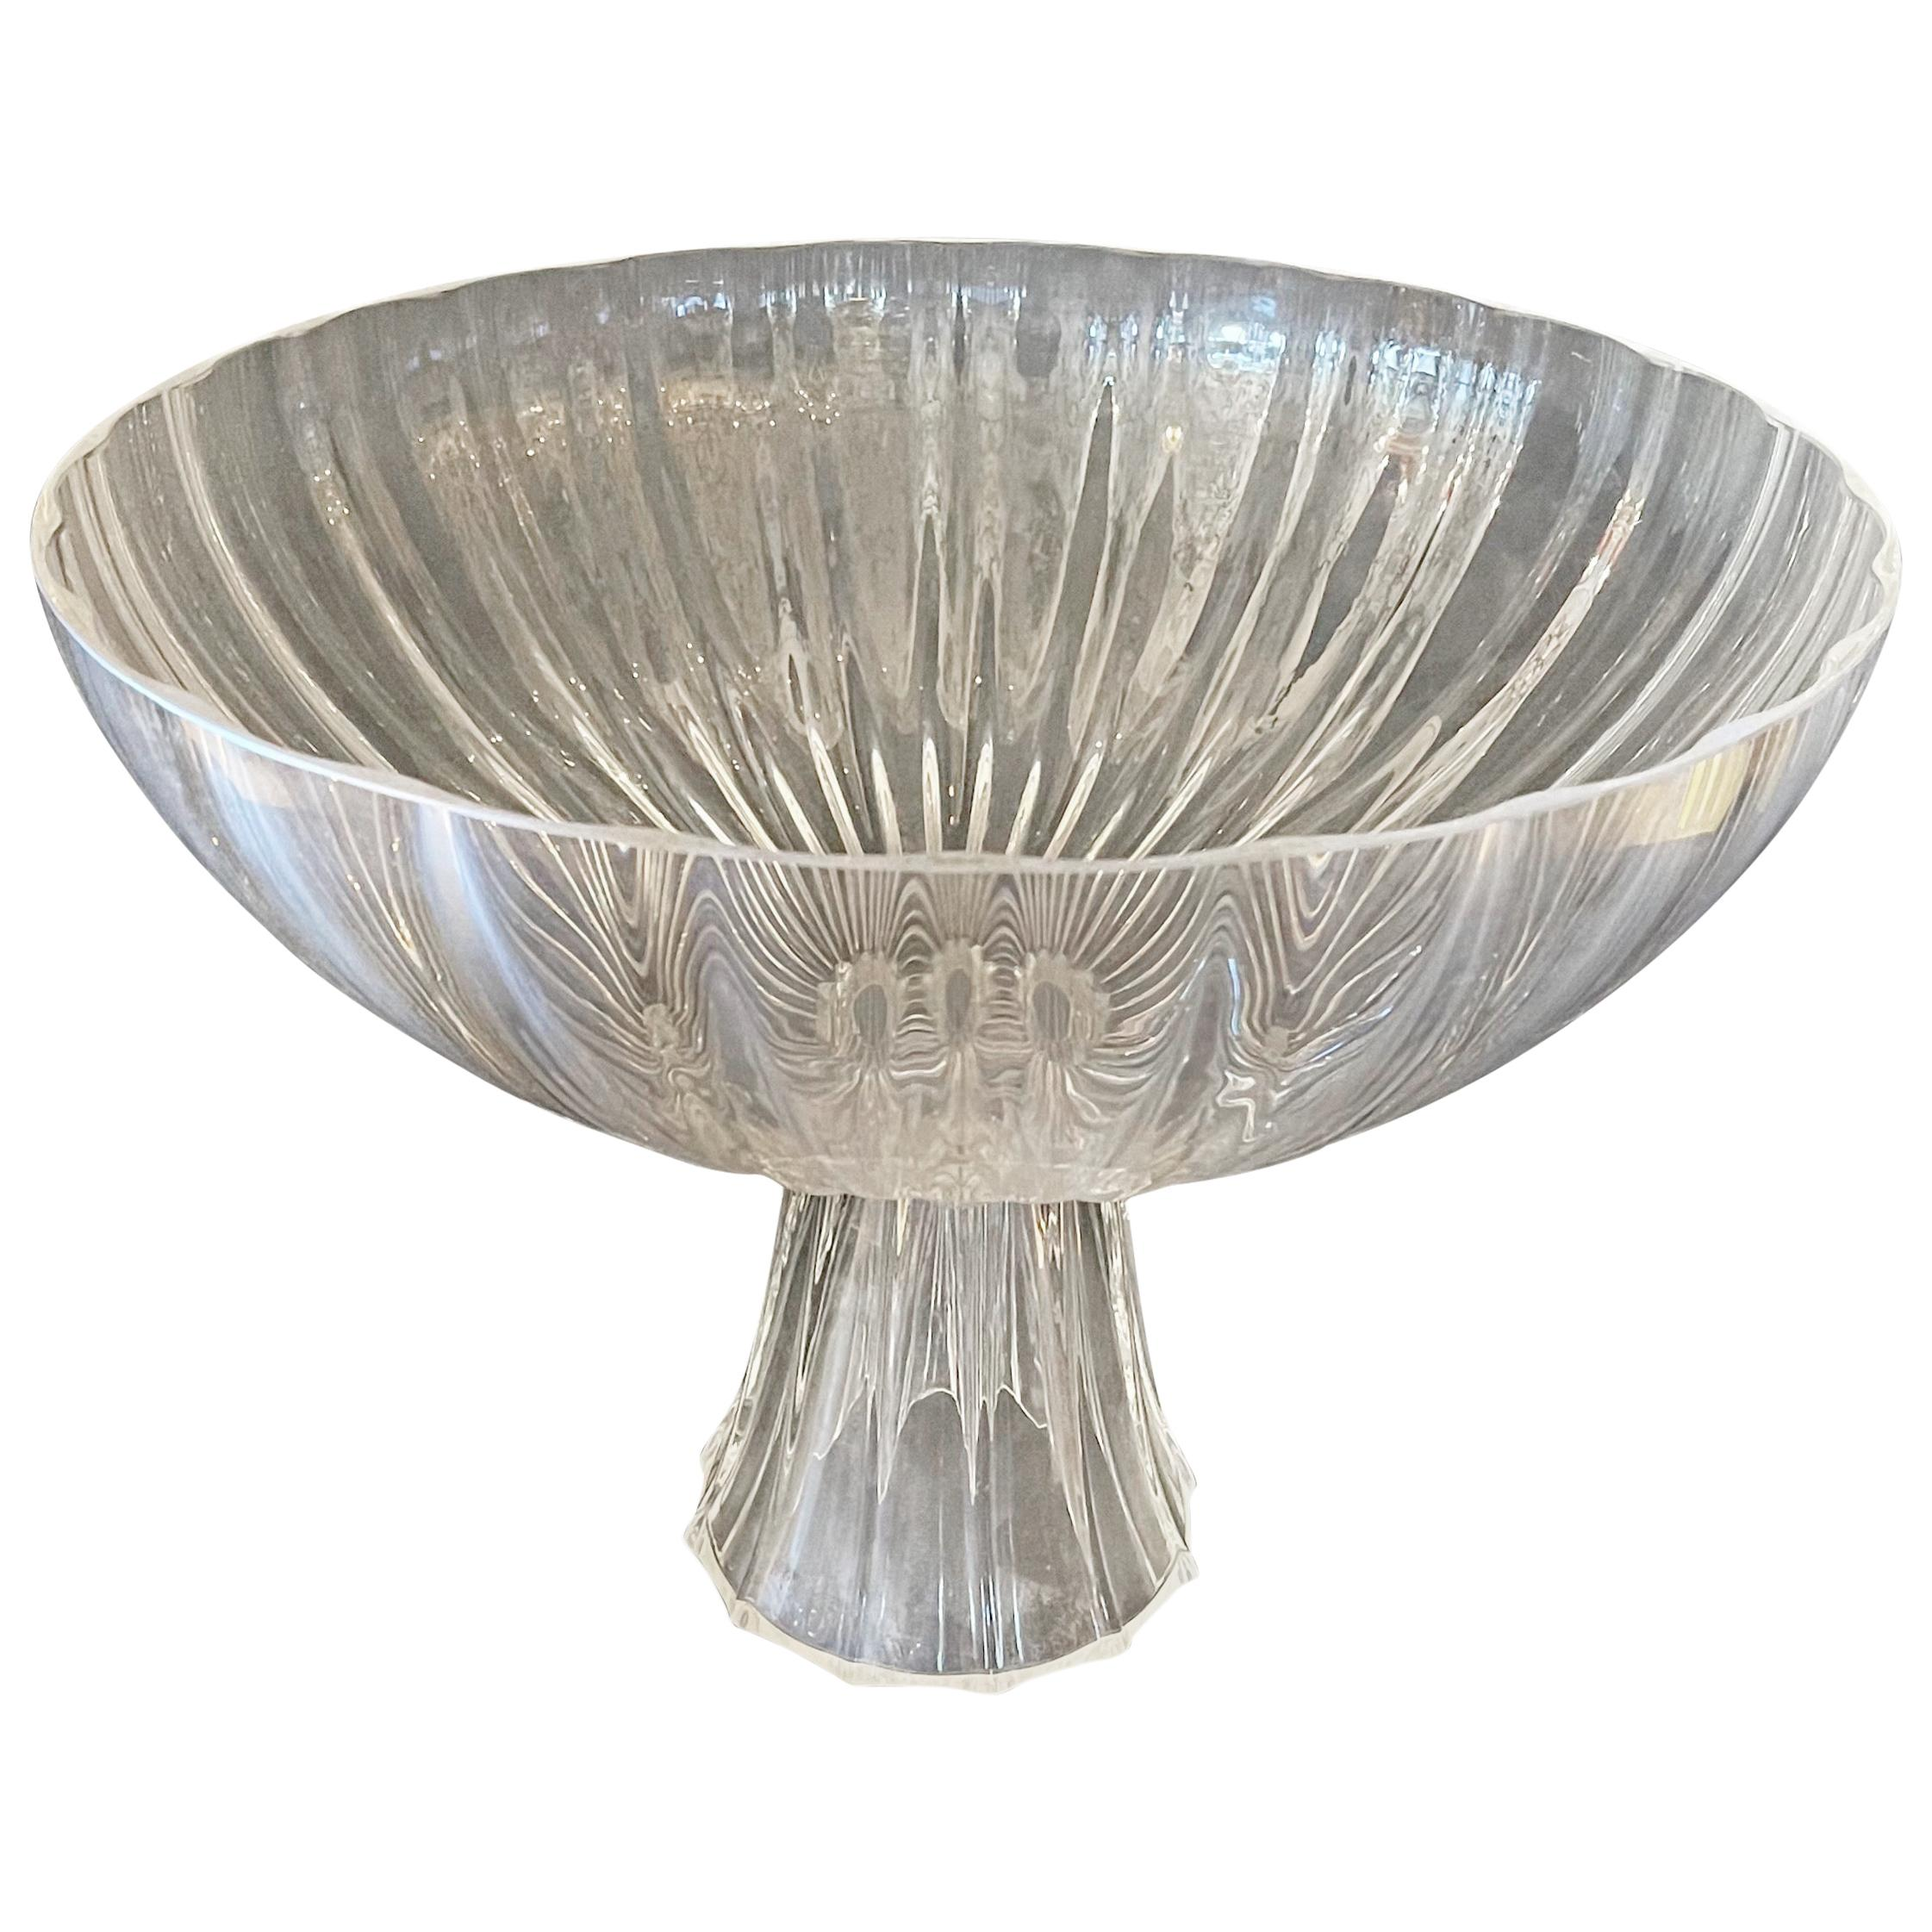 Wonderful Lorin Marsh Rigadin Bowl Clear Murano Glass Centerpiece Large Bowl